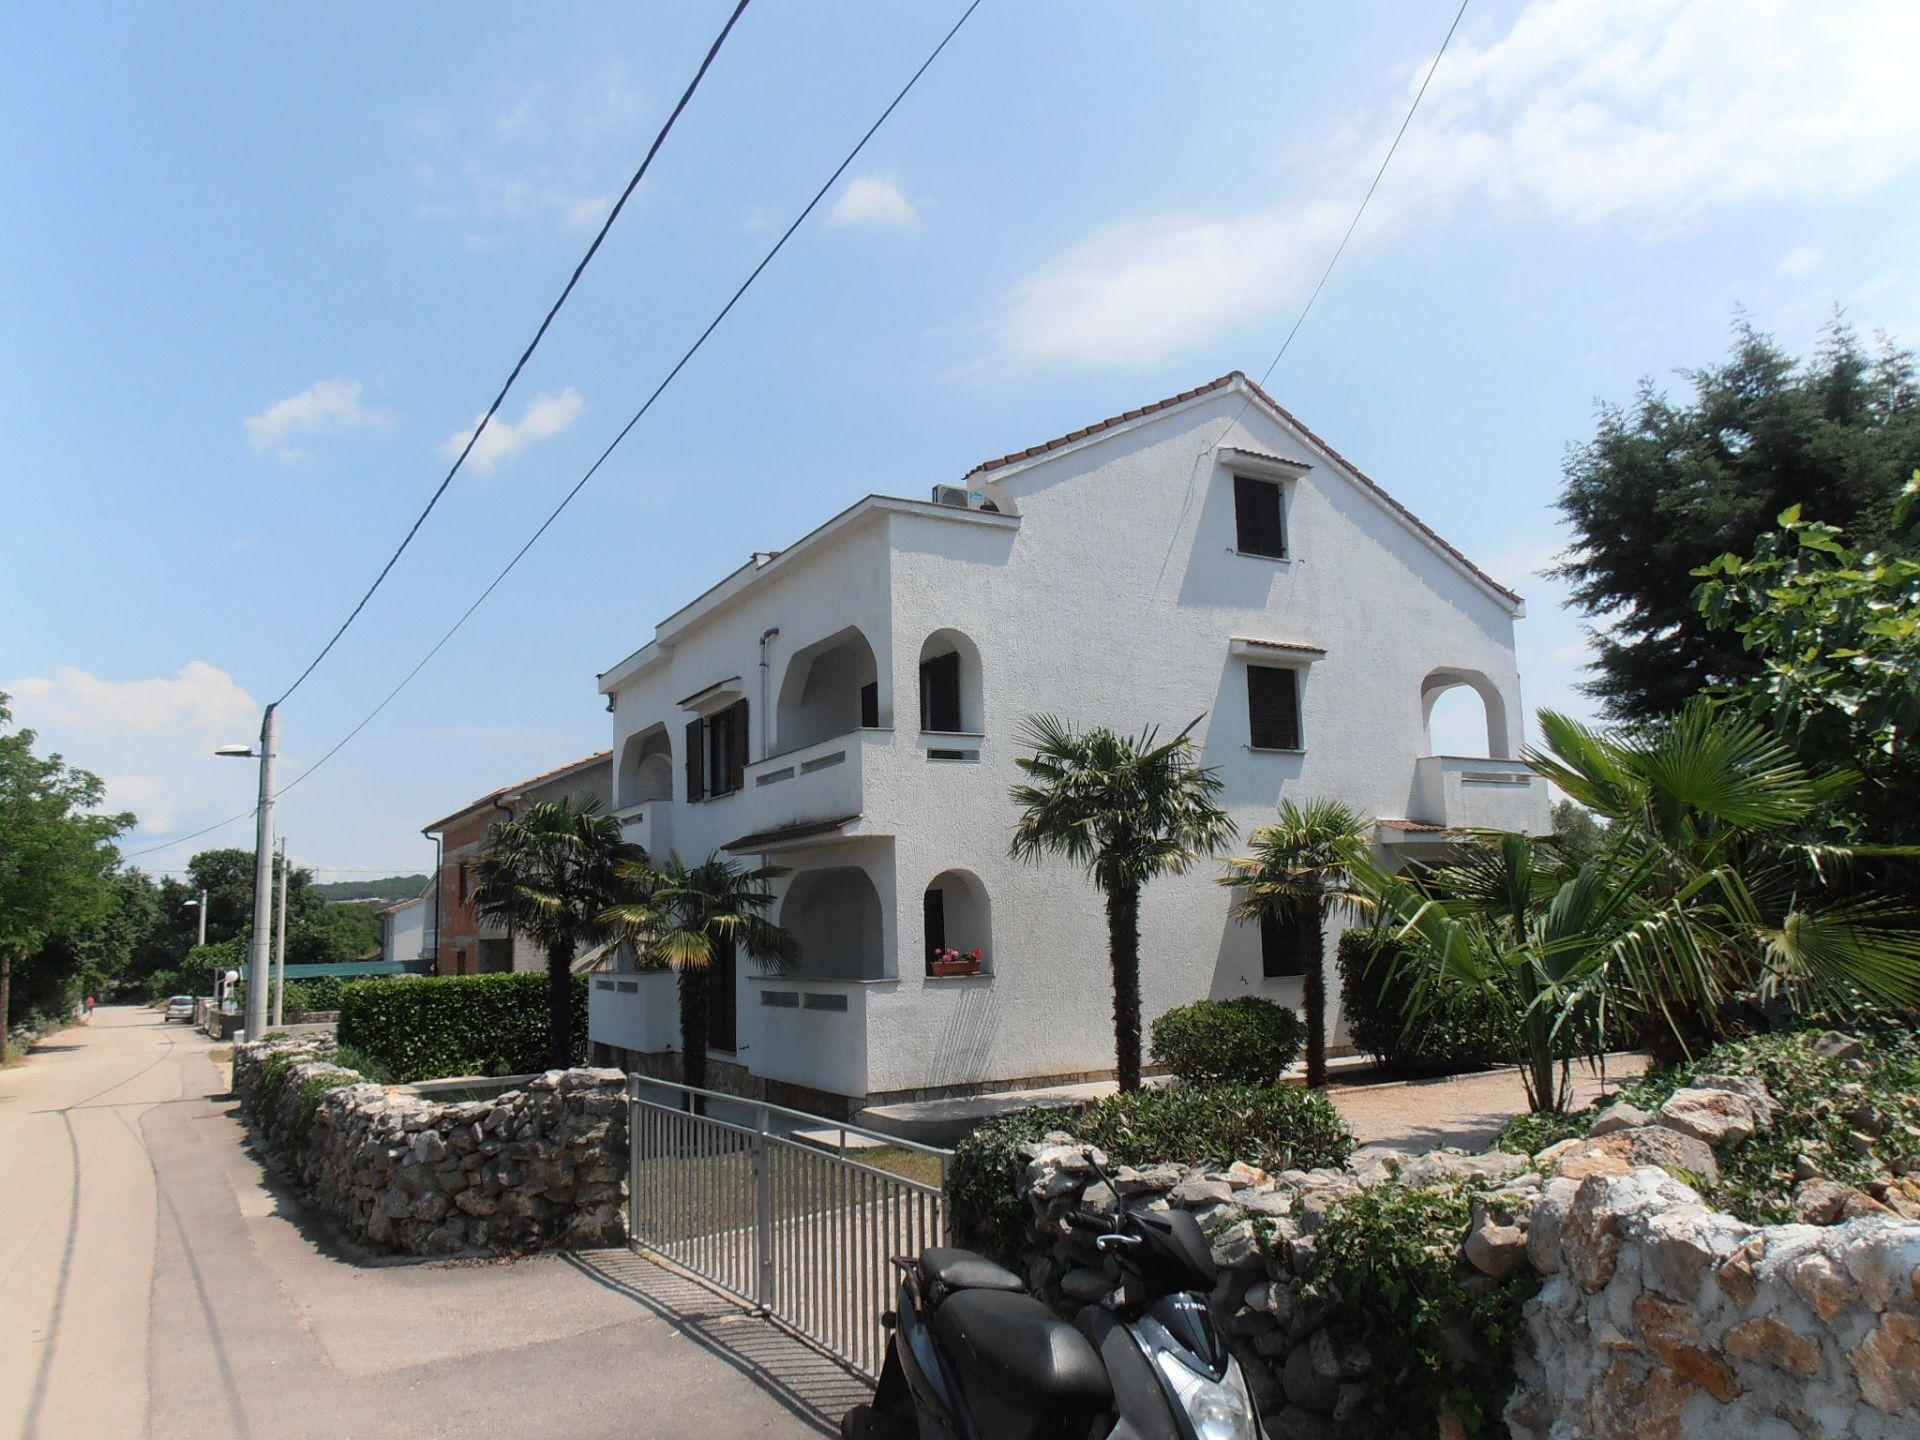 Apartmani, Malinska, Otok Krk - Apartmani   Dragica